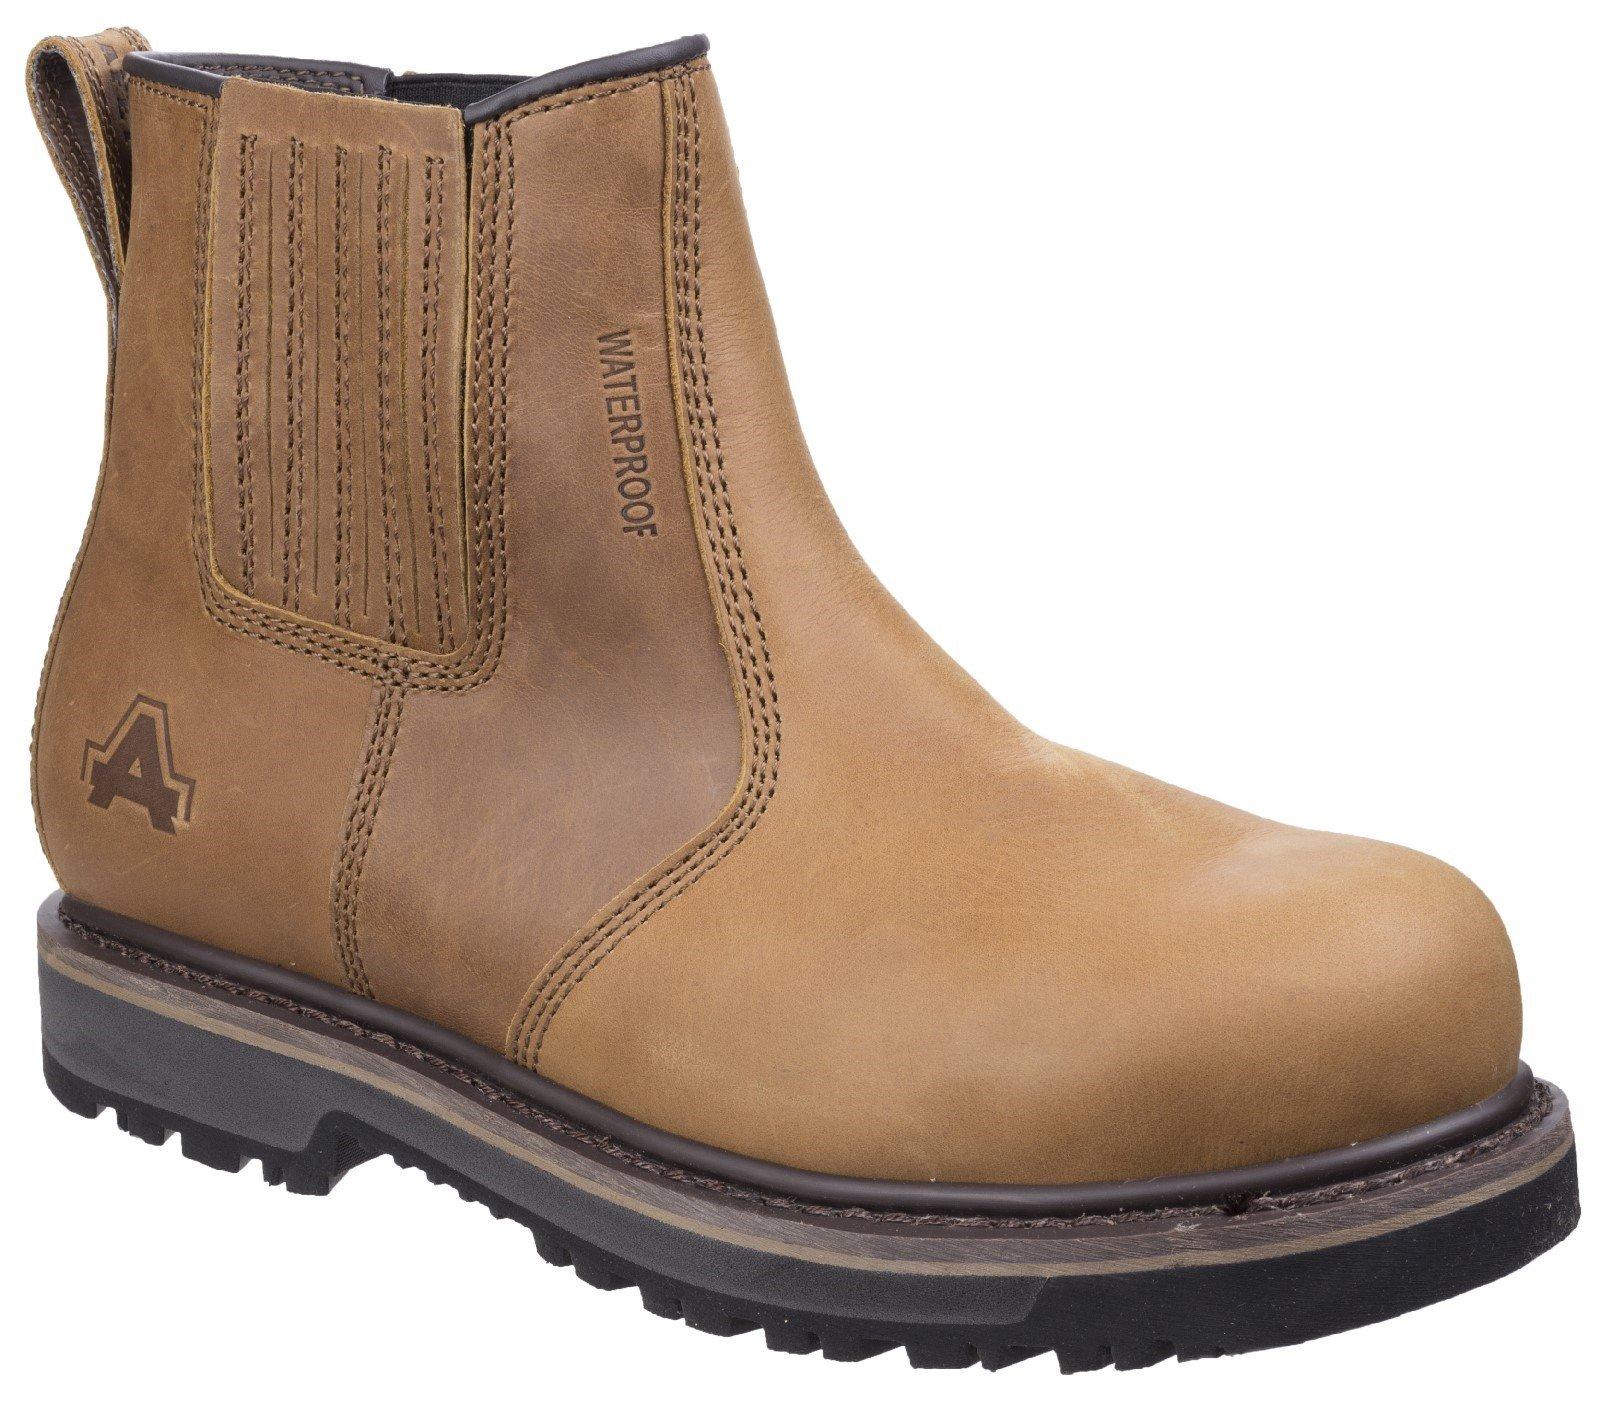 Amblers Unisex Safety Boot Tan 27095 - Tan 6